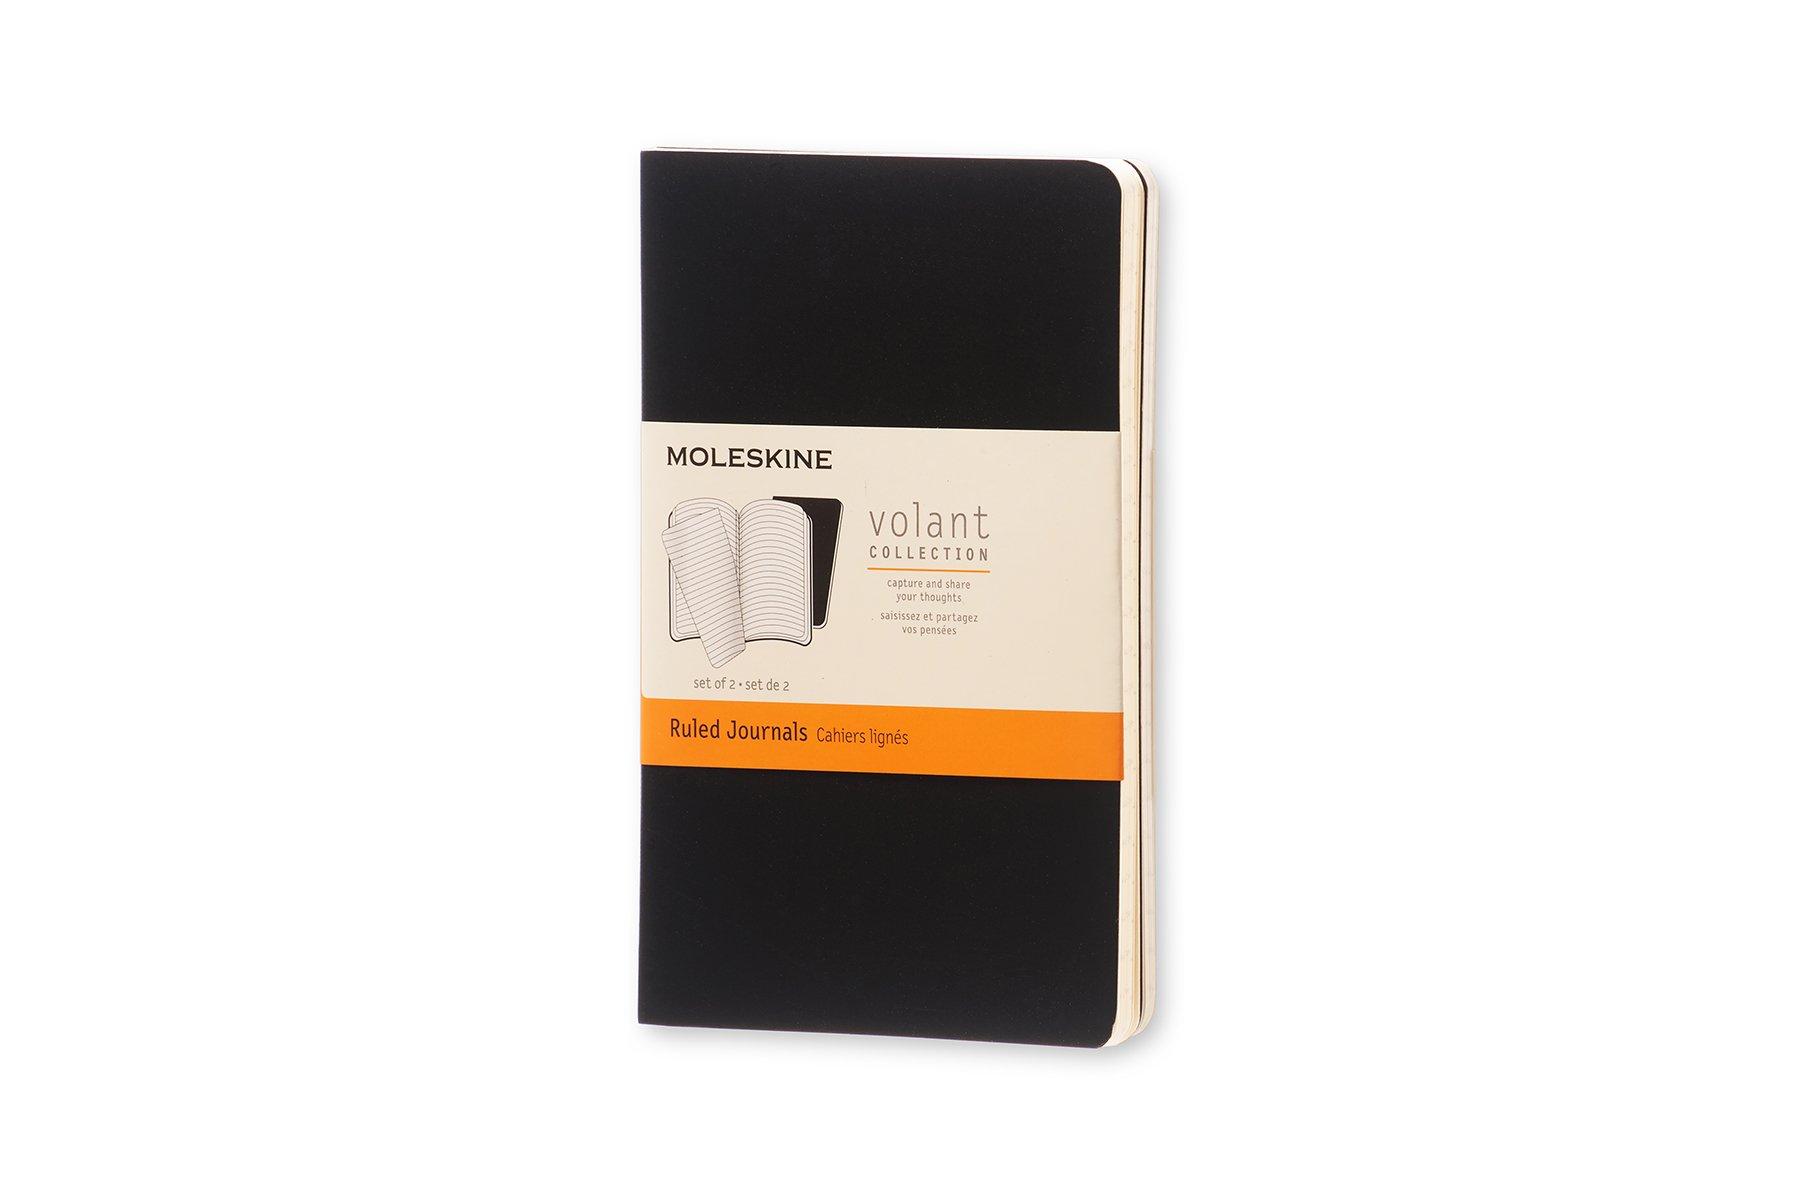 Moleskine Volant Soft Cover Journal, Black, Ruled, Pocket x2